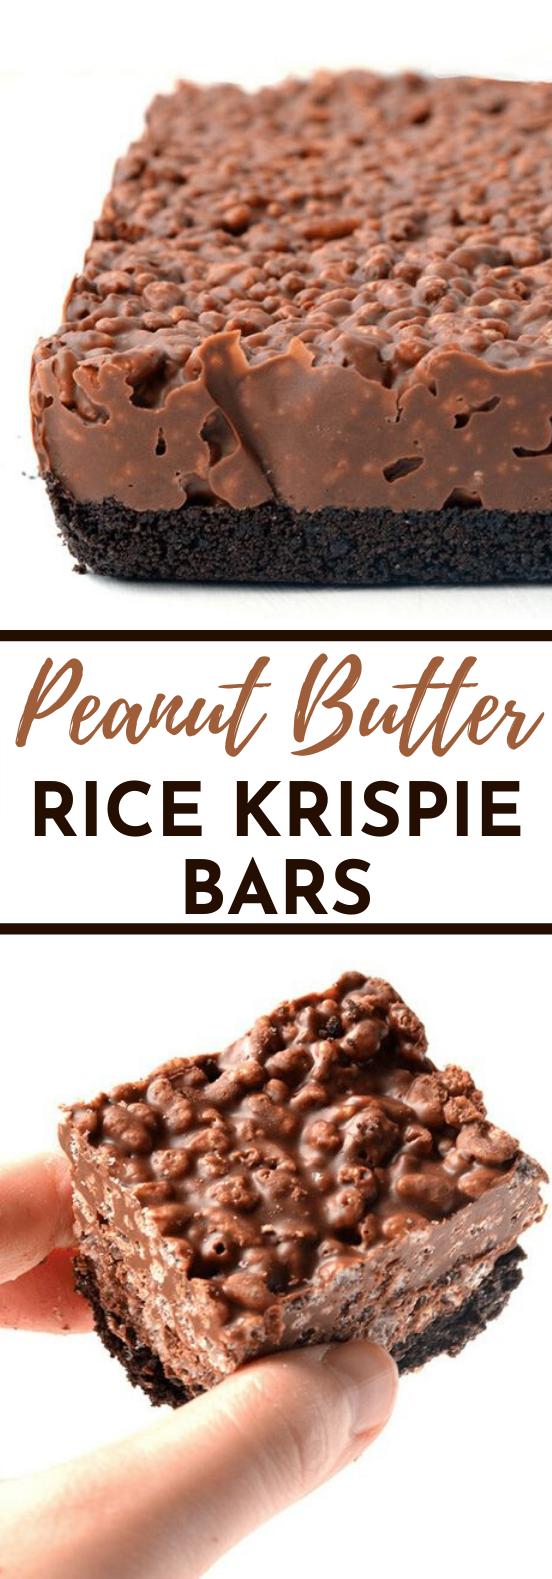 Peanut Butter Rice Krispie Bars #desserts #bars #peanutbutter #nobake #cookies